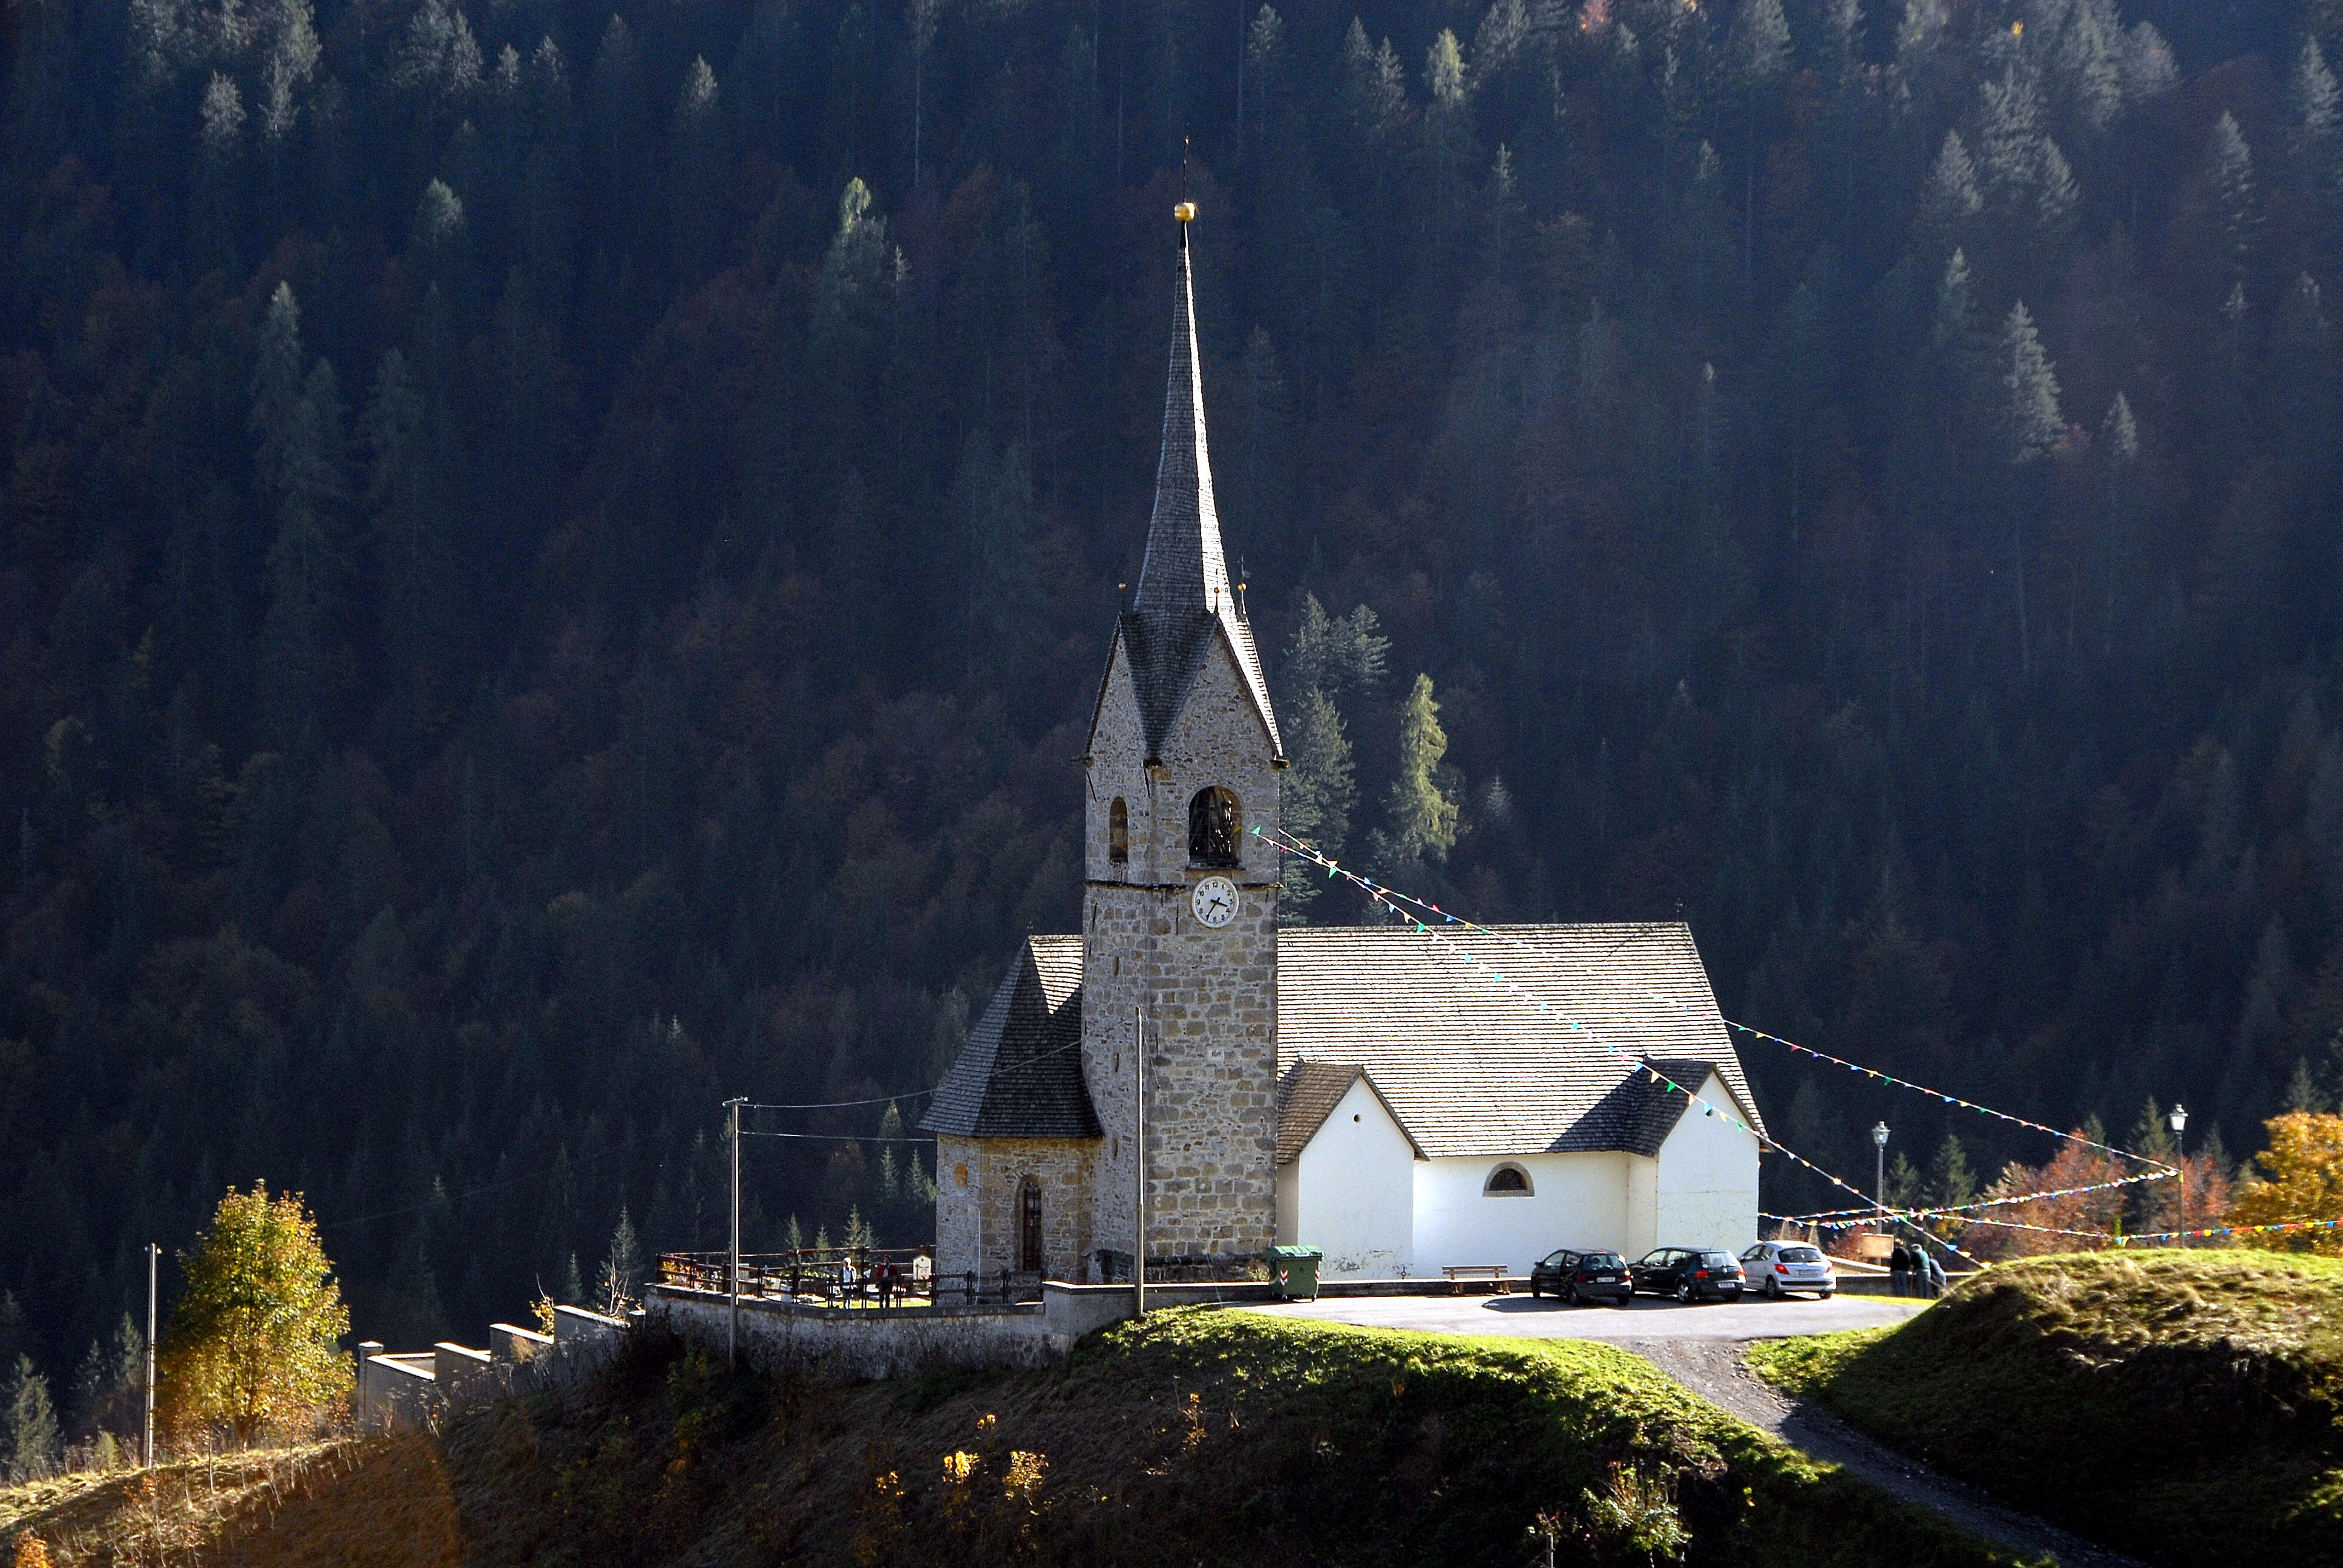 Sauris di sopra Pfarrkirche Heiliger Stefan 07102007 64